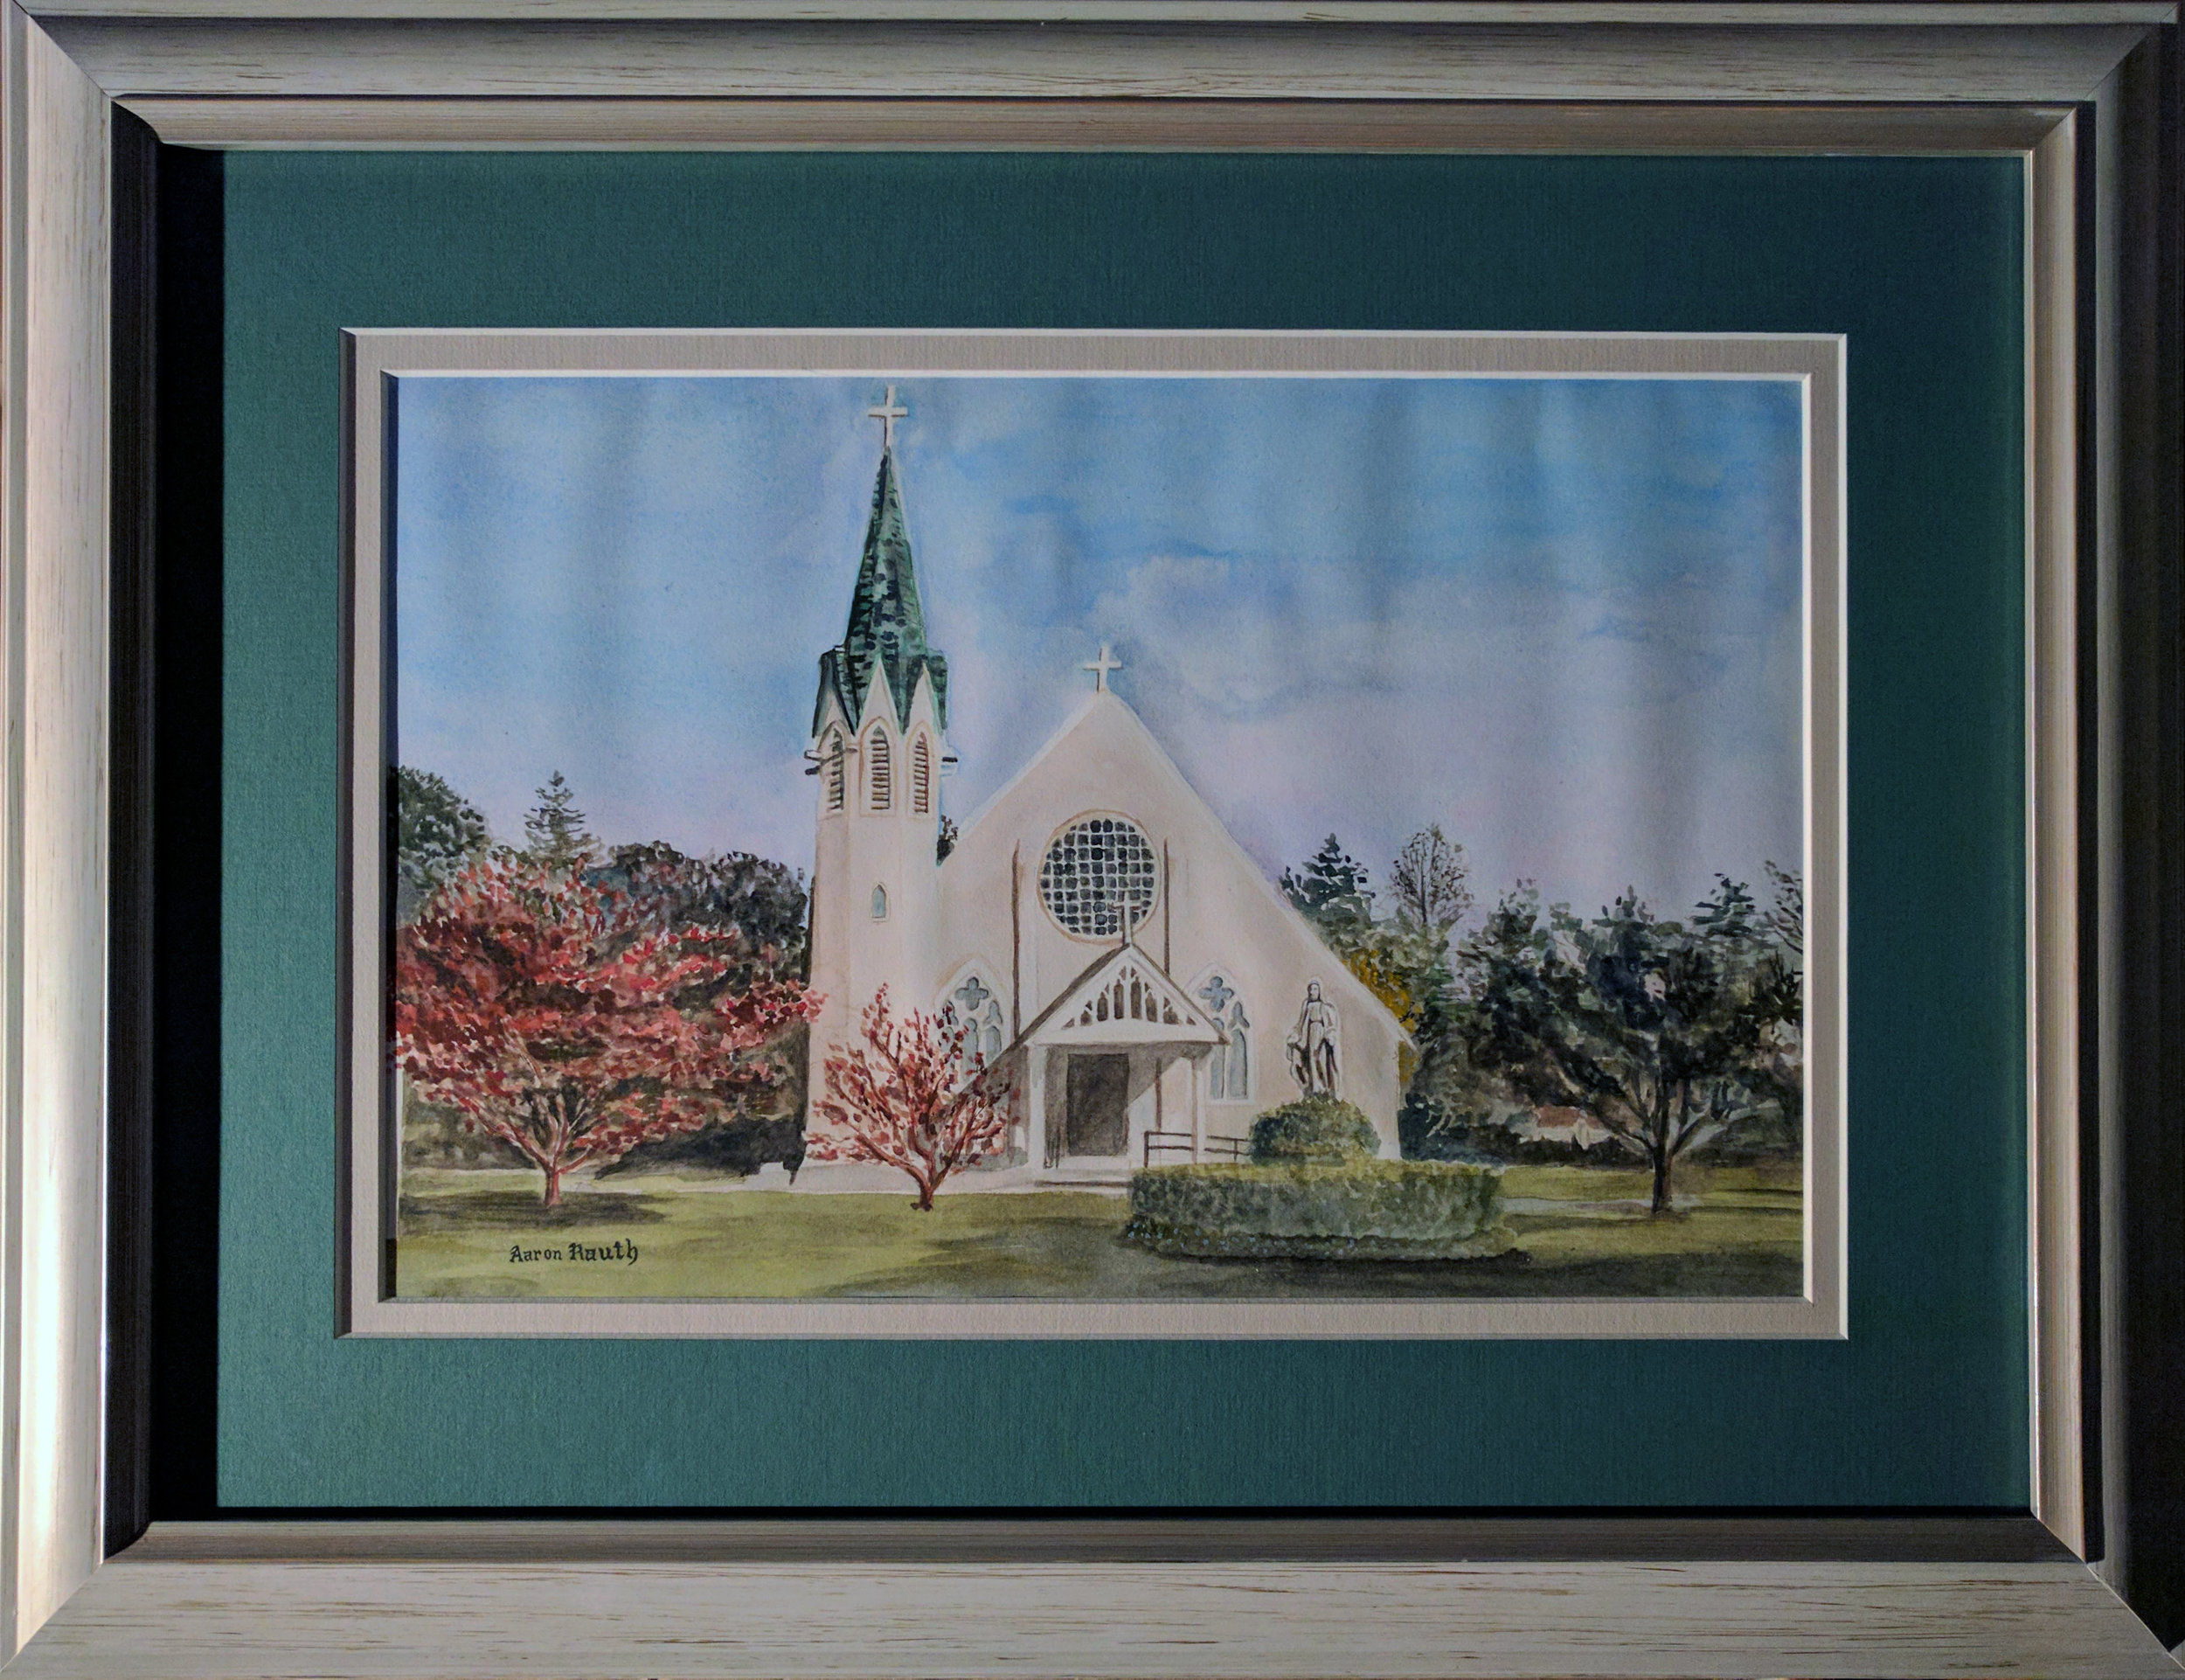 Saint John The Evangelist, Center Moriches, NY.